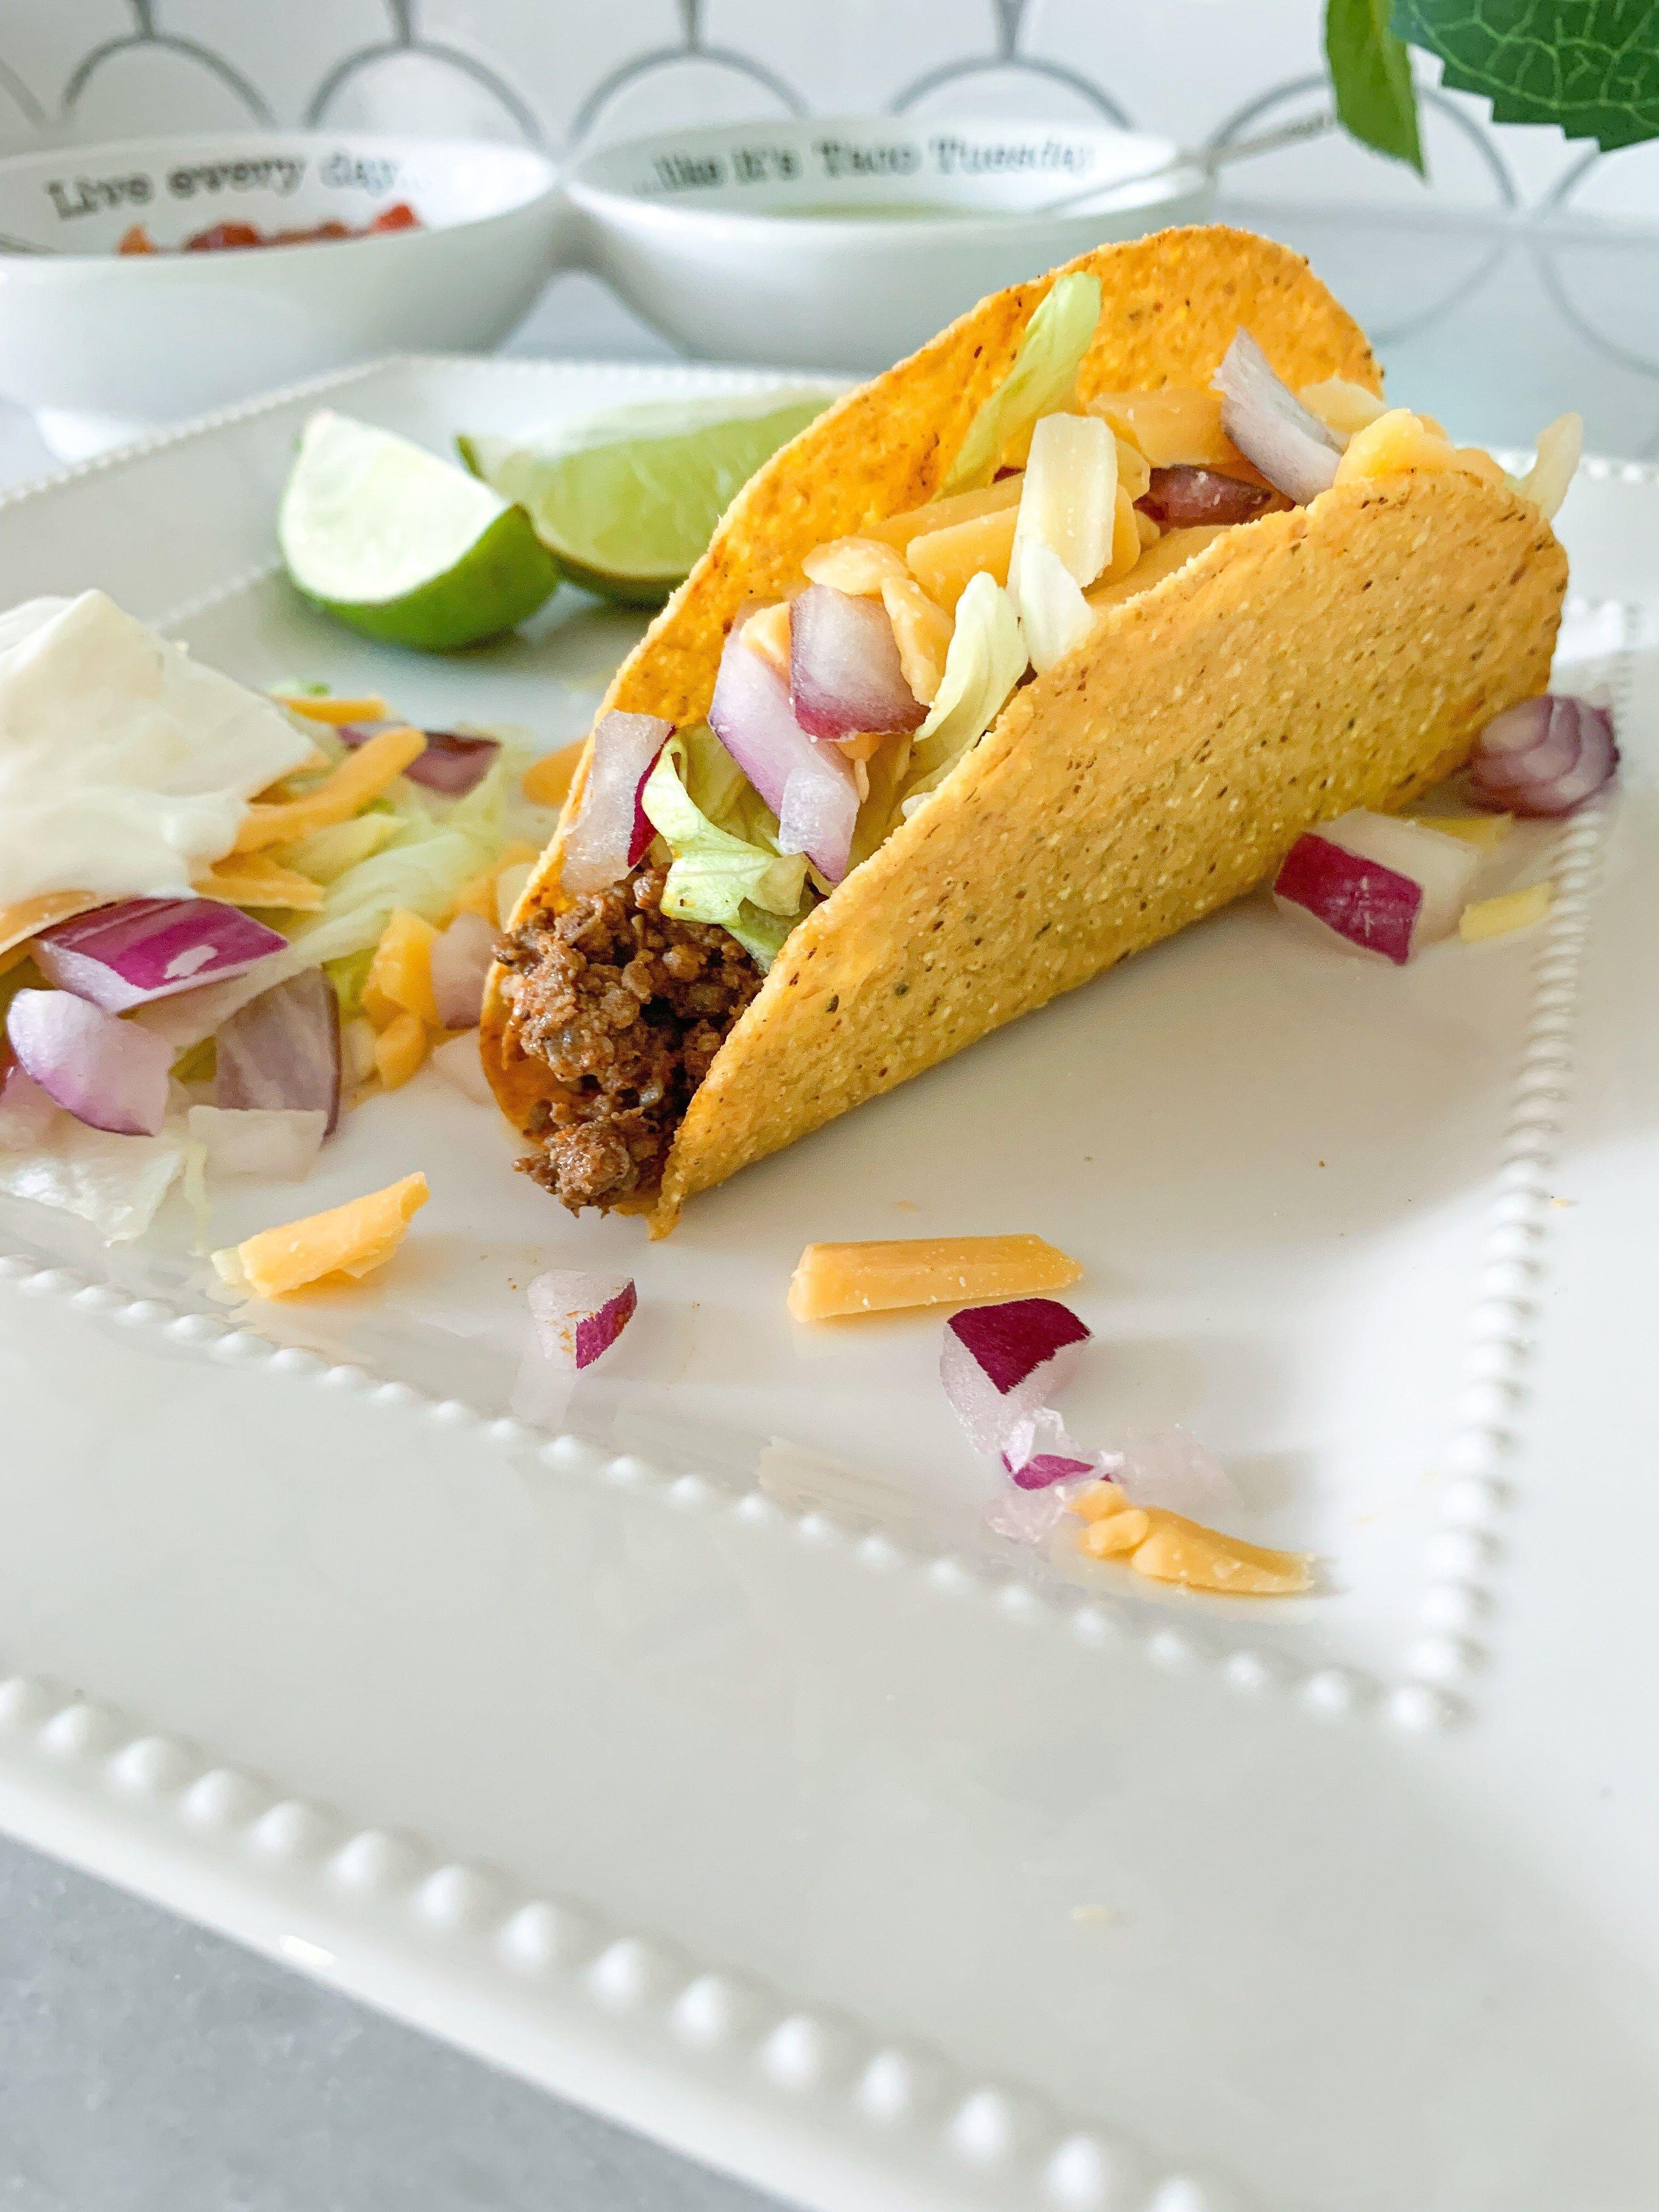 The Best Ground Beef Tex-Mex Tacos #maketacoseasoning The Best Ground Beef Tex-Mex Tacos (With Homemade Taco Seasoning) » We're The Joneses #tacoseasoningpacket The Best Ground Beef Tex-Mex Tacos #maketacoseasoning The Best Ground Beef Tex-Mex Tacos (With Homemade Taco Seasoning) » We're The Joneses #tacoseasoningpacket The Best Ground Beef Tex-Mex Tacos #maketacoseasoning The Best Ground Beef Tex-Mex Tacos (With Homemade Taco Seasoning) » We're The Joneses #tacoseasoningpacket The Best Groun #tacoseasoningpacket